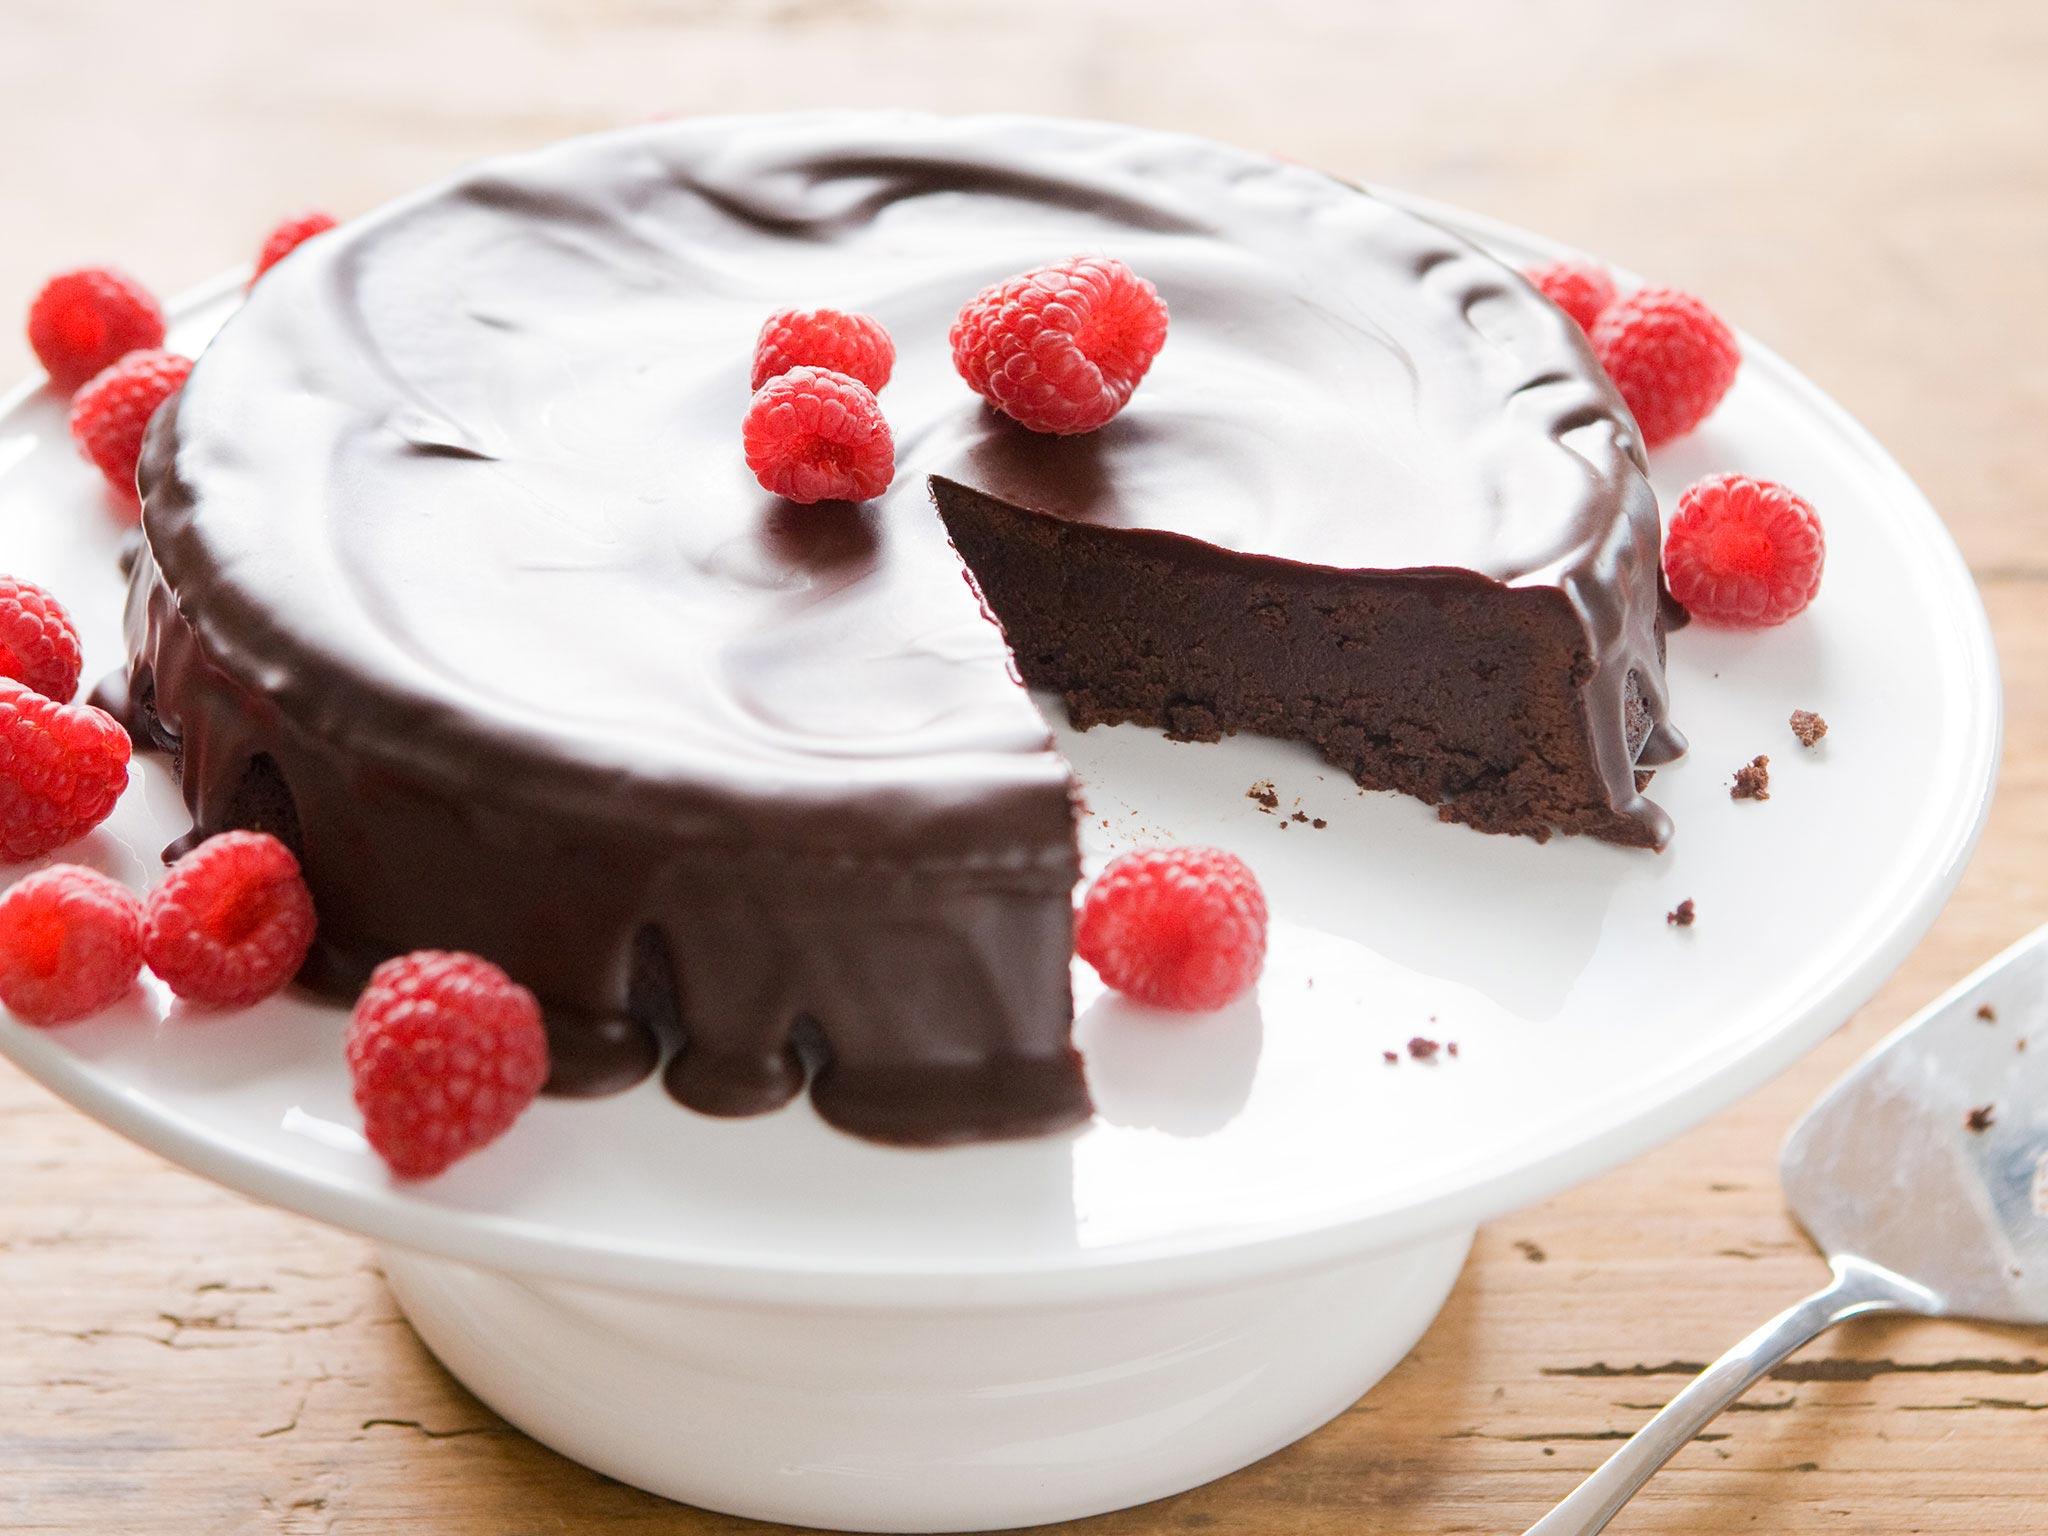 Recipe Flourless Chocolate Cake With Dark Chocolate Glaze Whole Foods Market